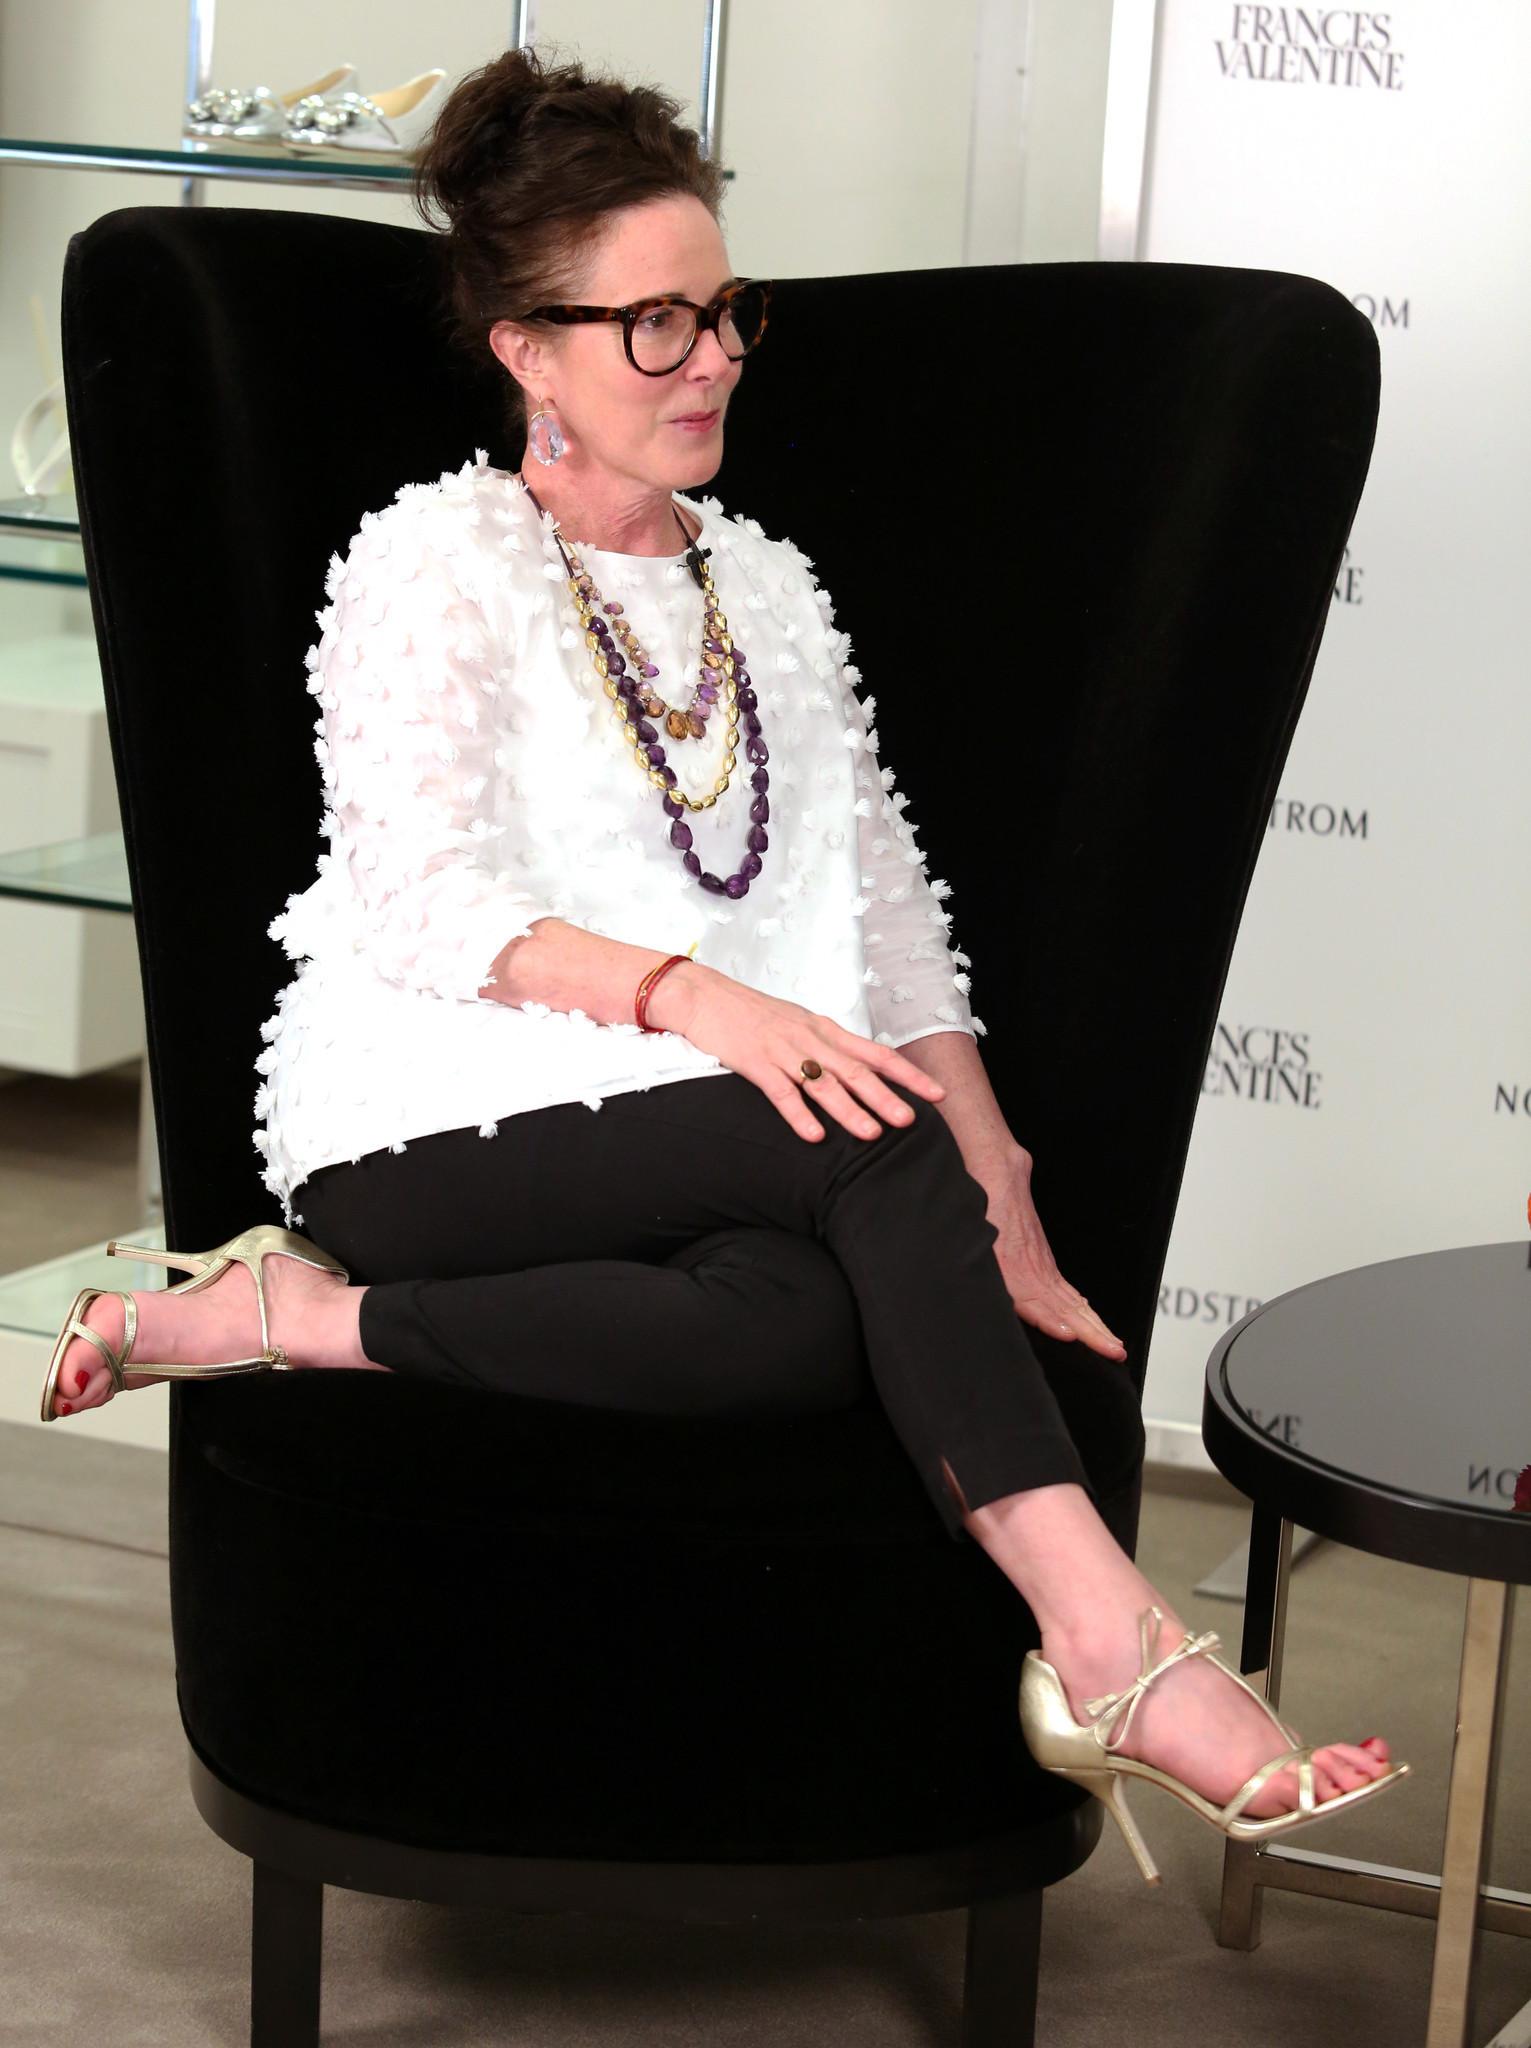 Kate Valentine Designer Known For Kate Spade Brand